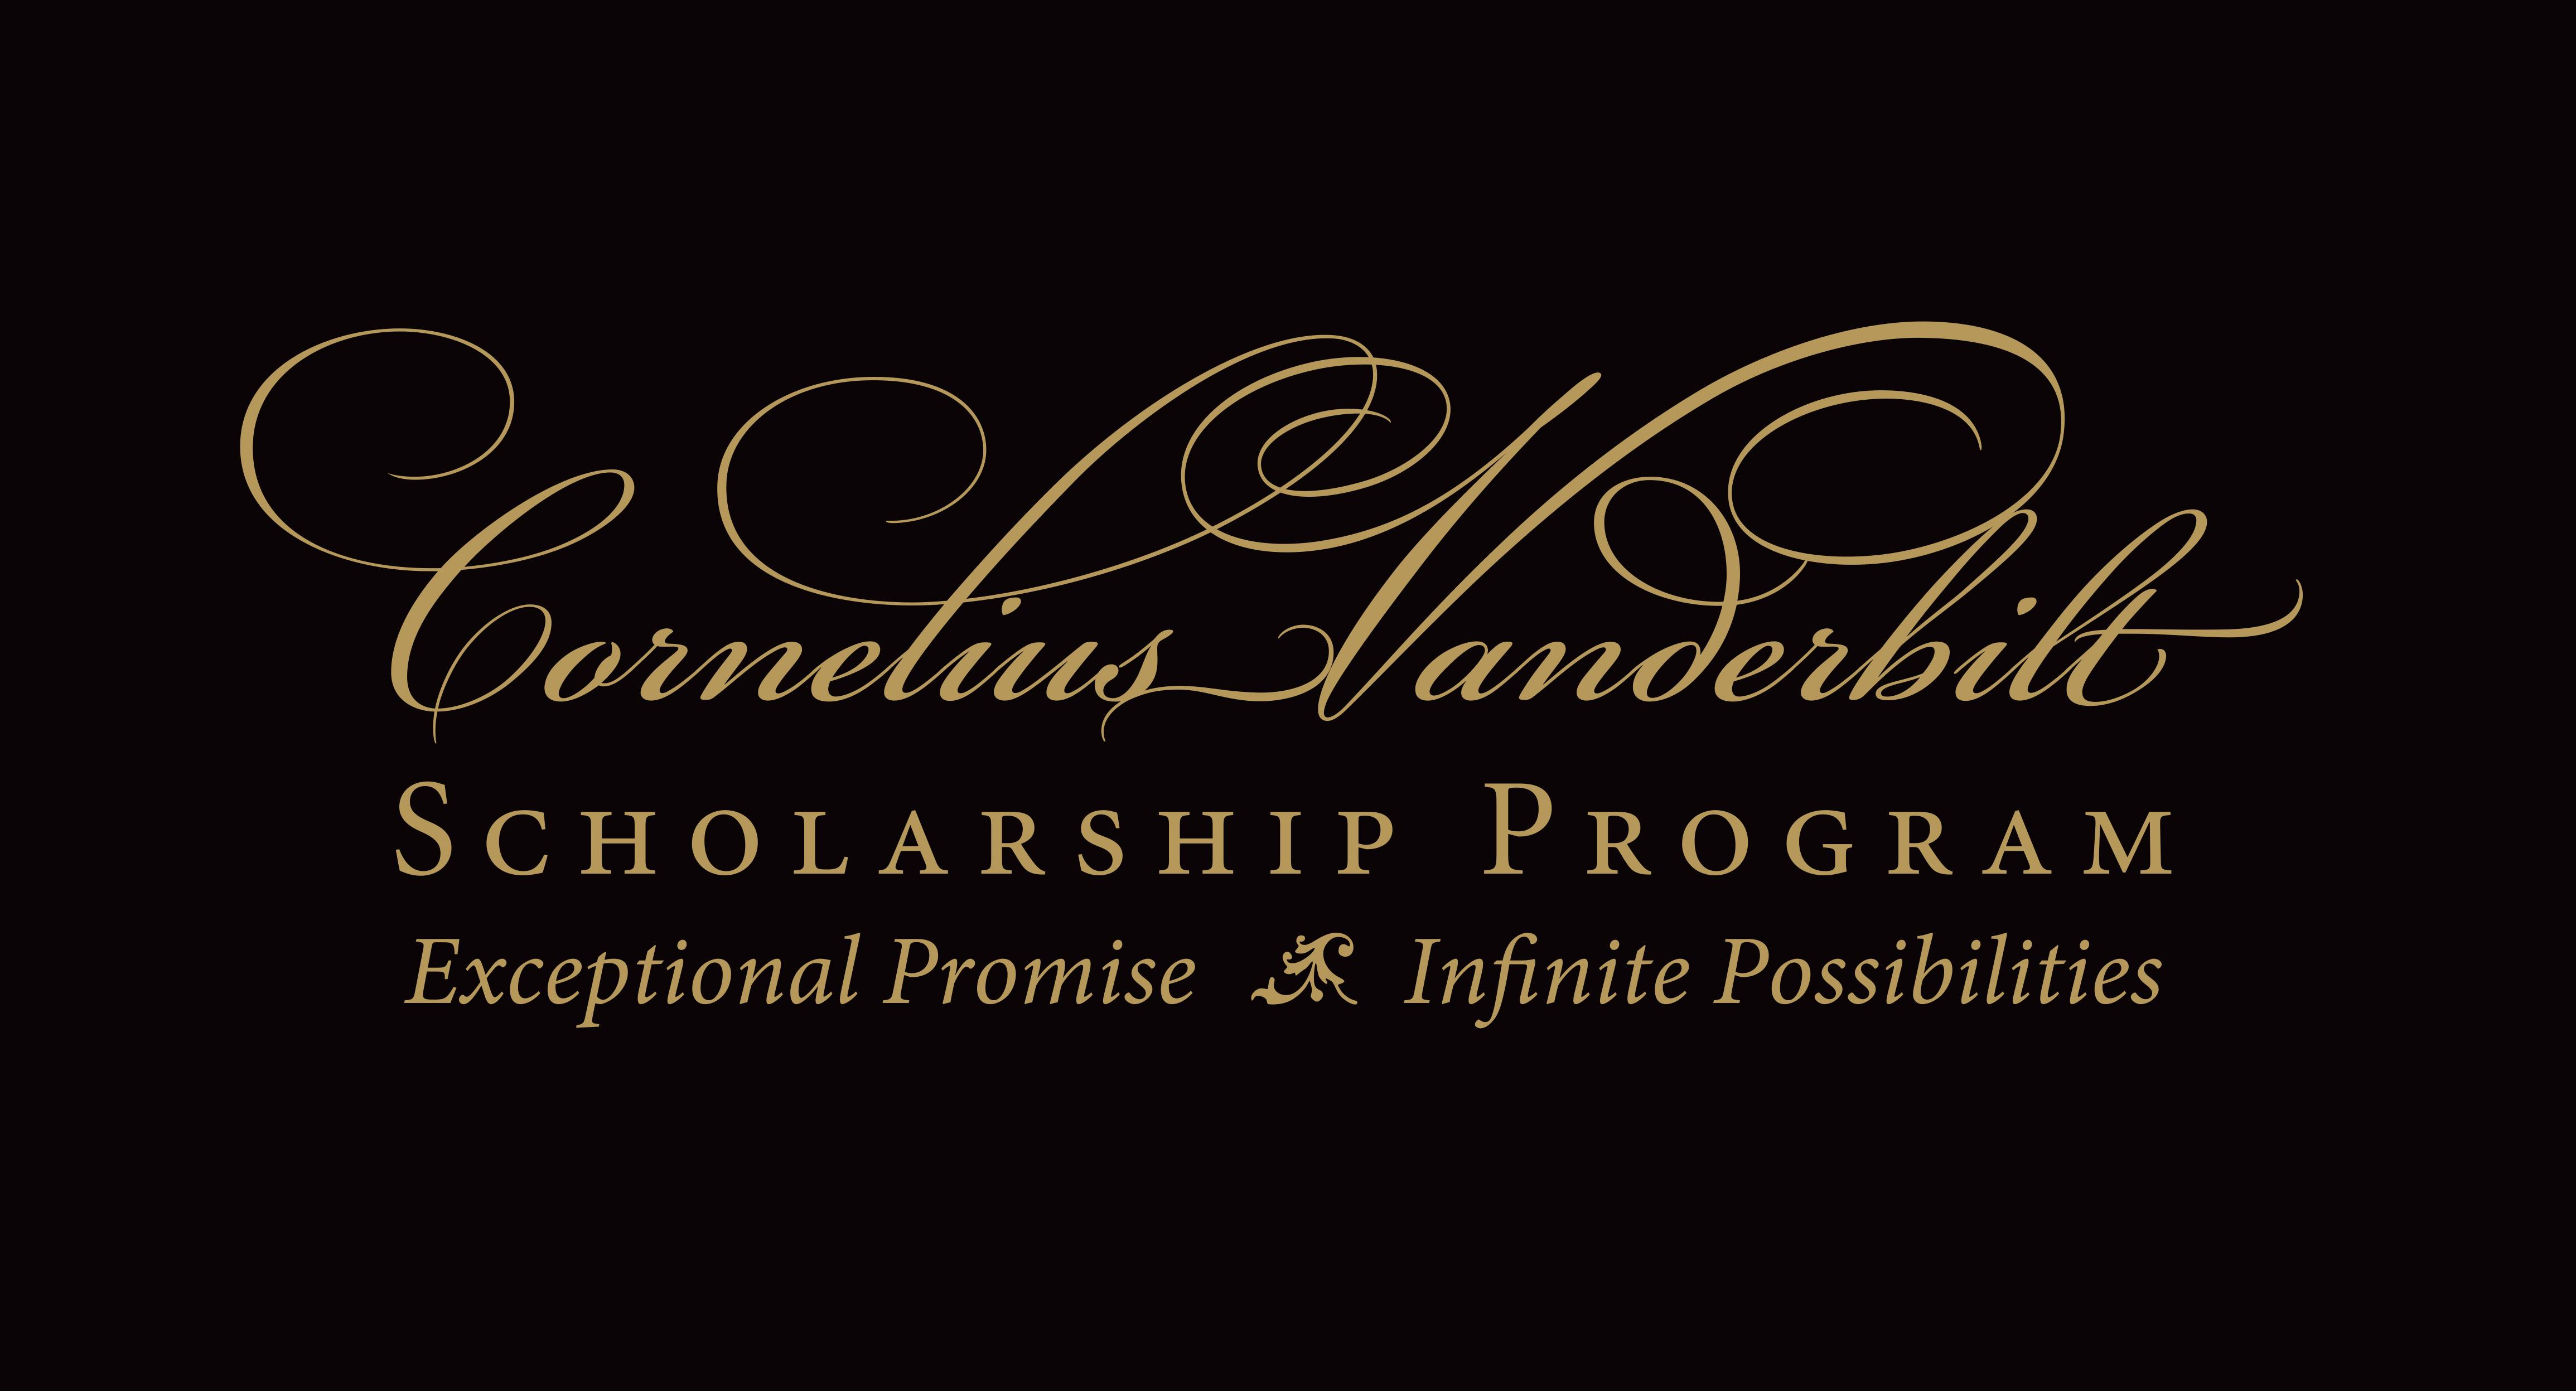 Cornelius Vanderbilt Scholarship